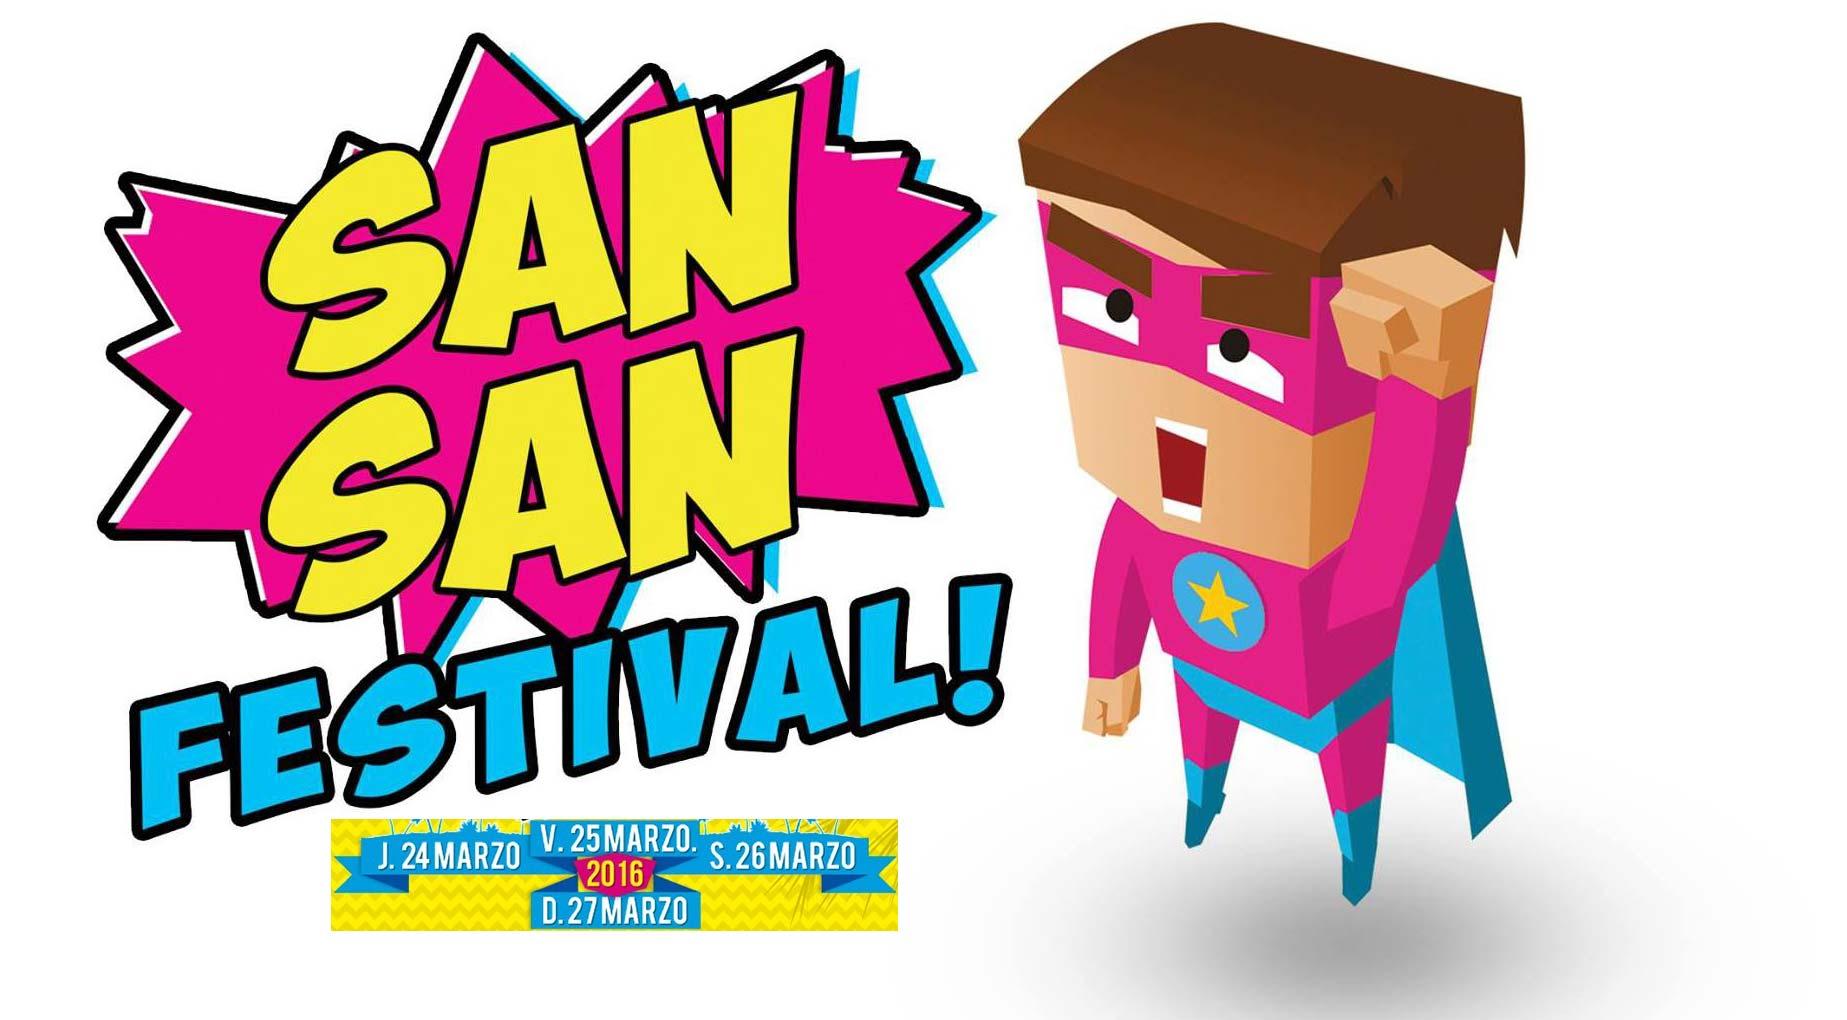 Cartel del SanSan festival 2016